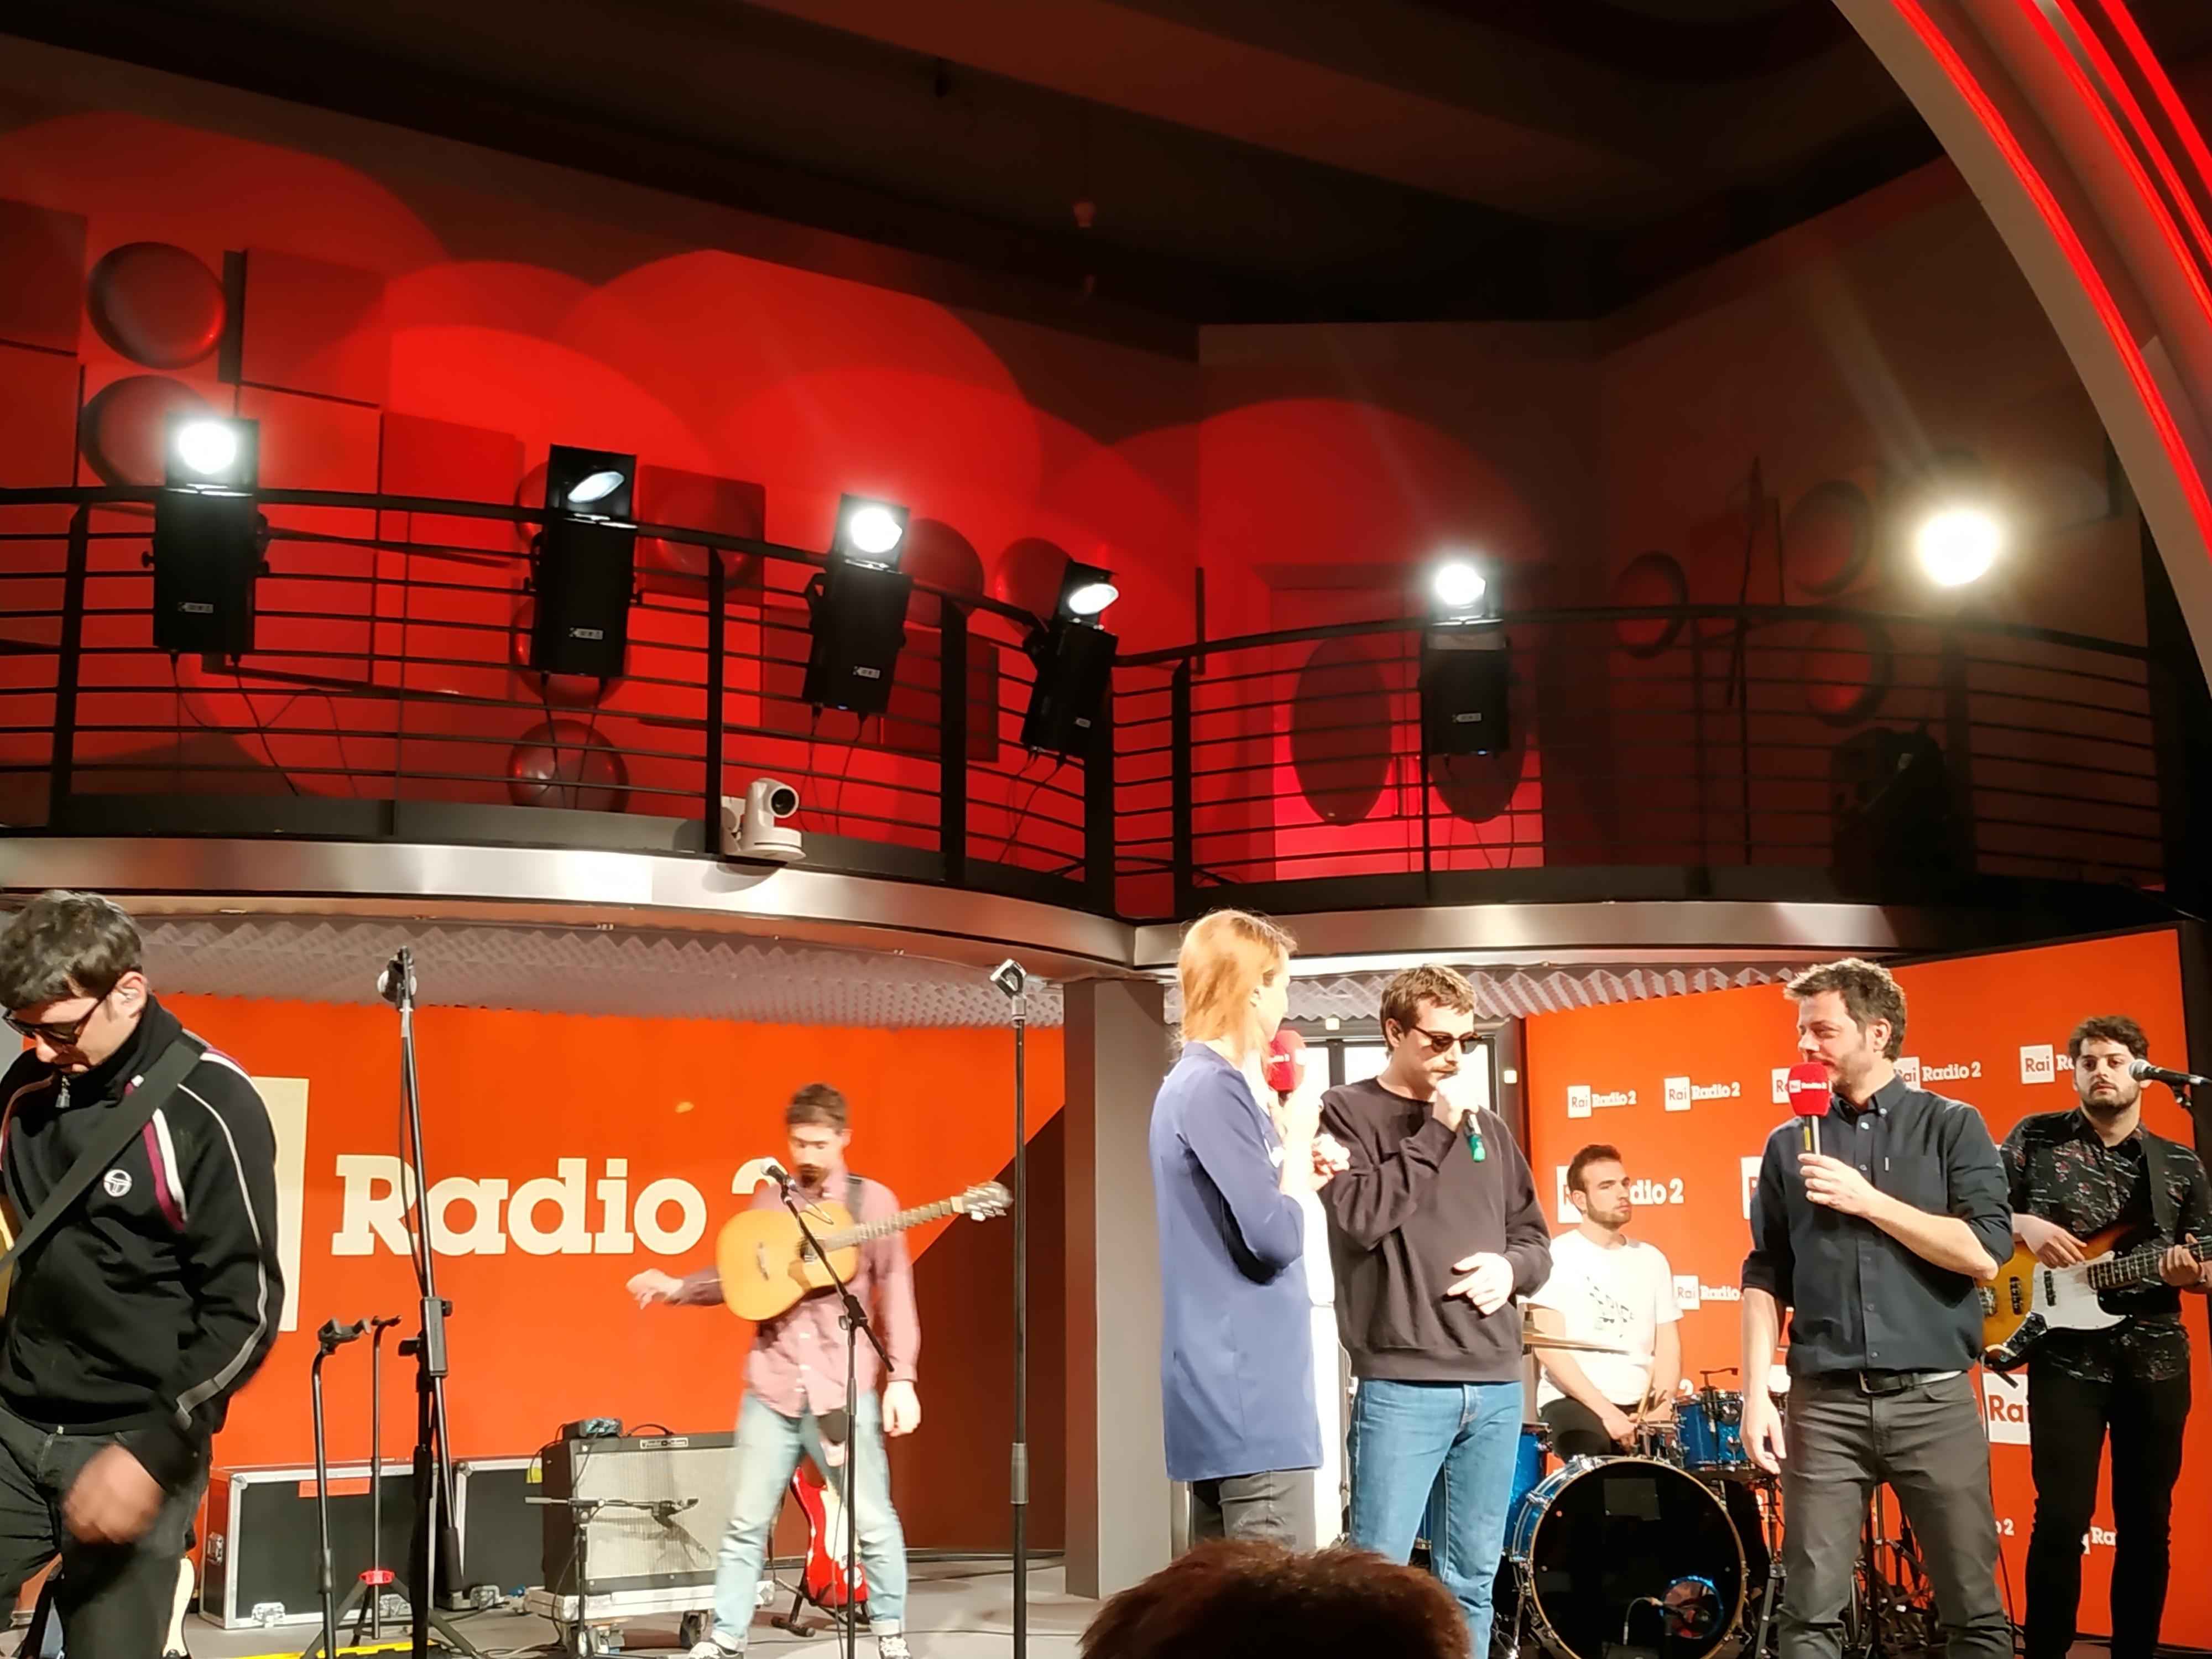 MUSICA Franco 126 a Rai Radio2